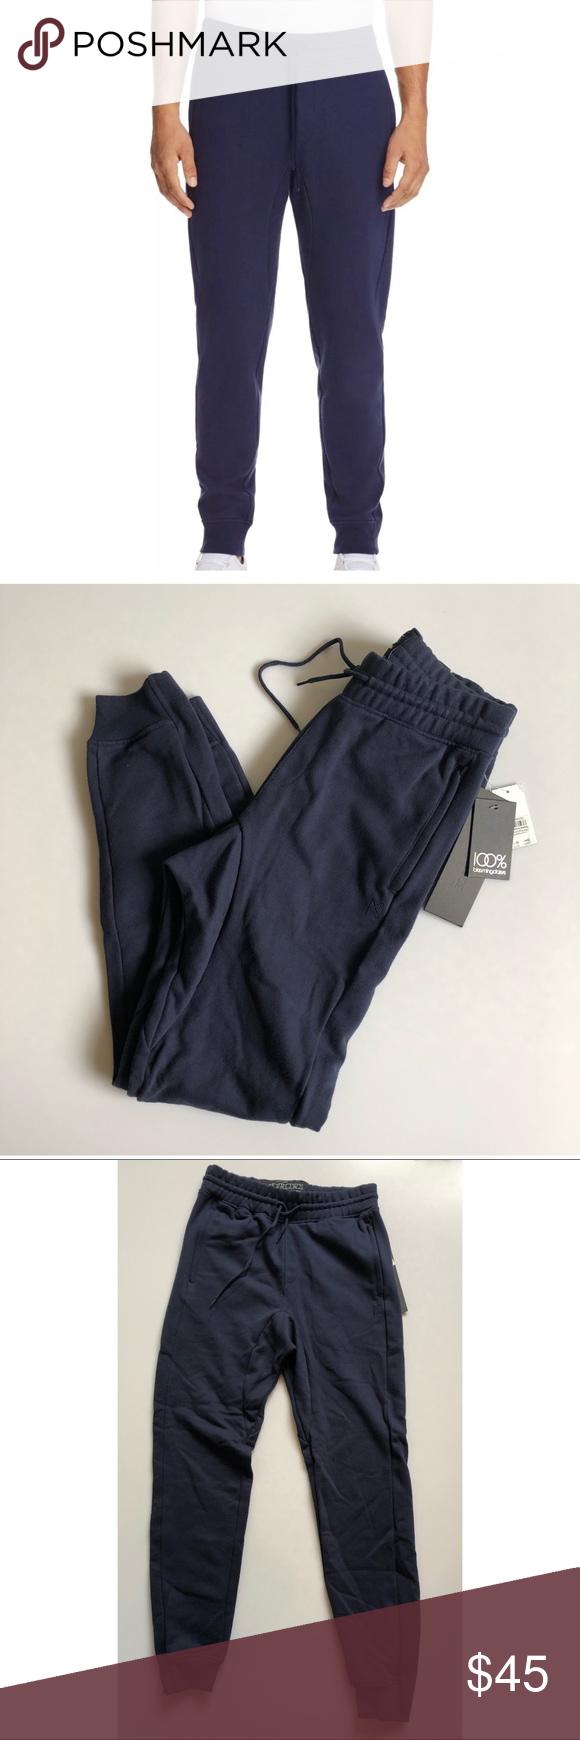 064c7503d18041 New men's The Narrows Navy Blue sweatpants joggers New men's The Narrows  Hidden Welt Pocket Joggers Color: navy blue Drawstring waist 60% cotton /  40% ...